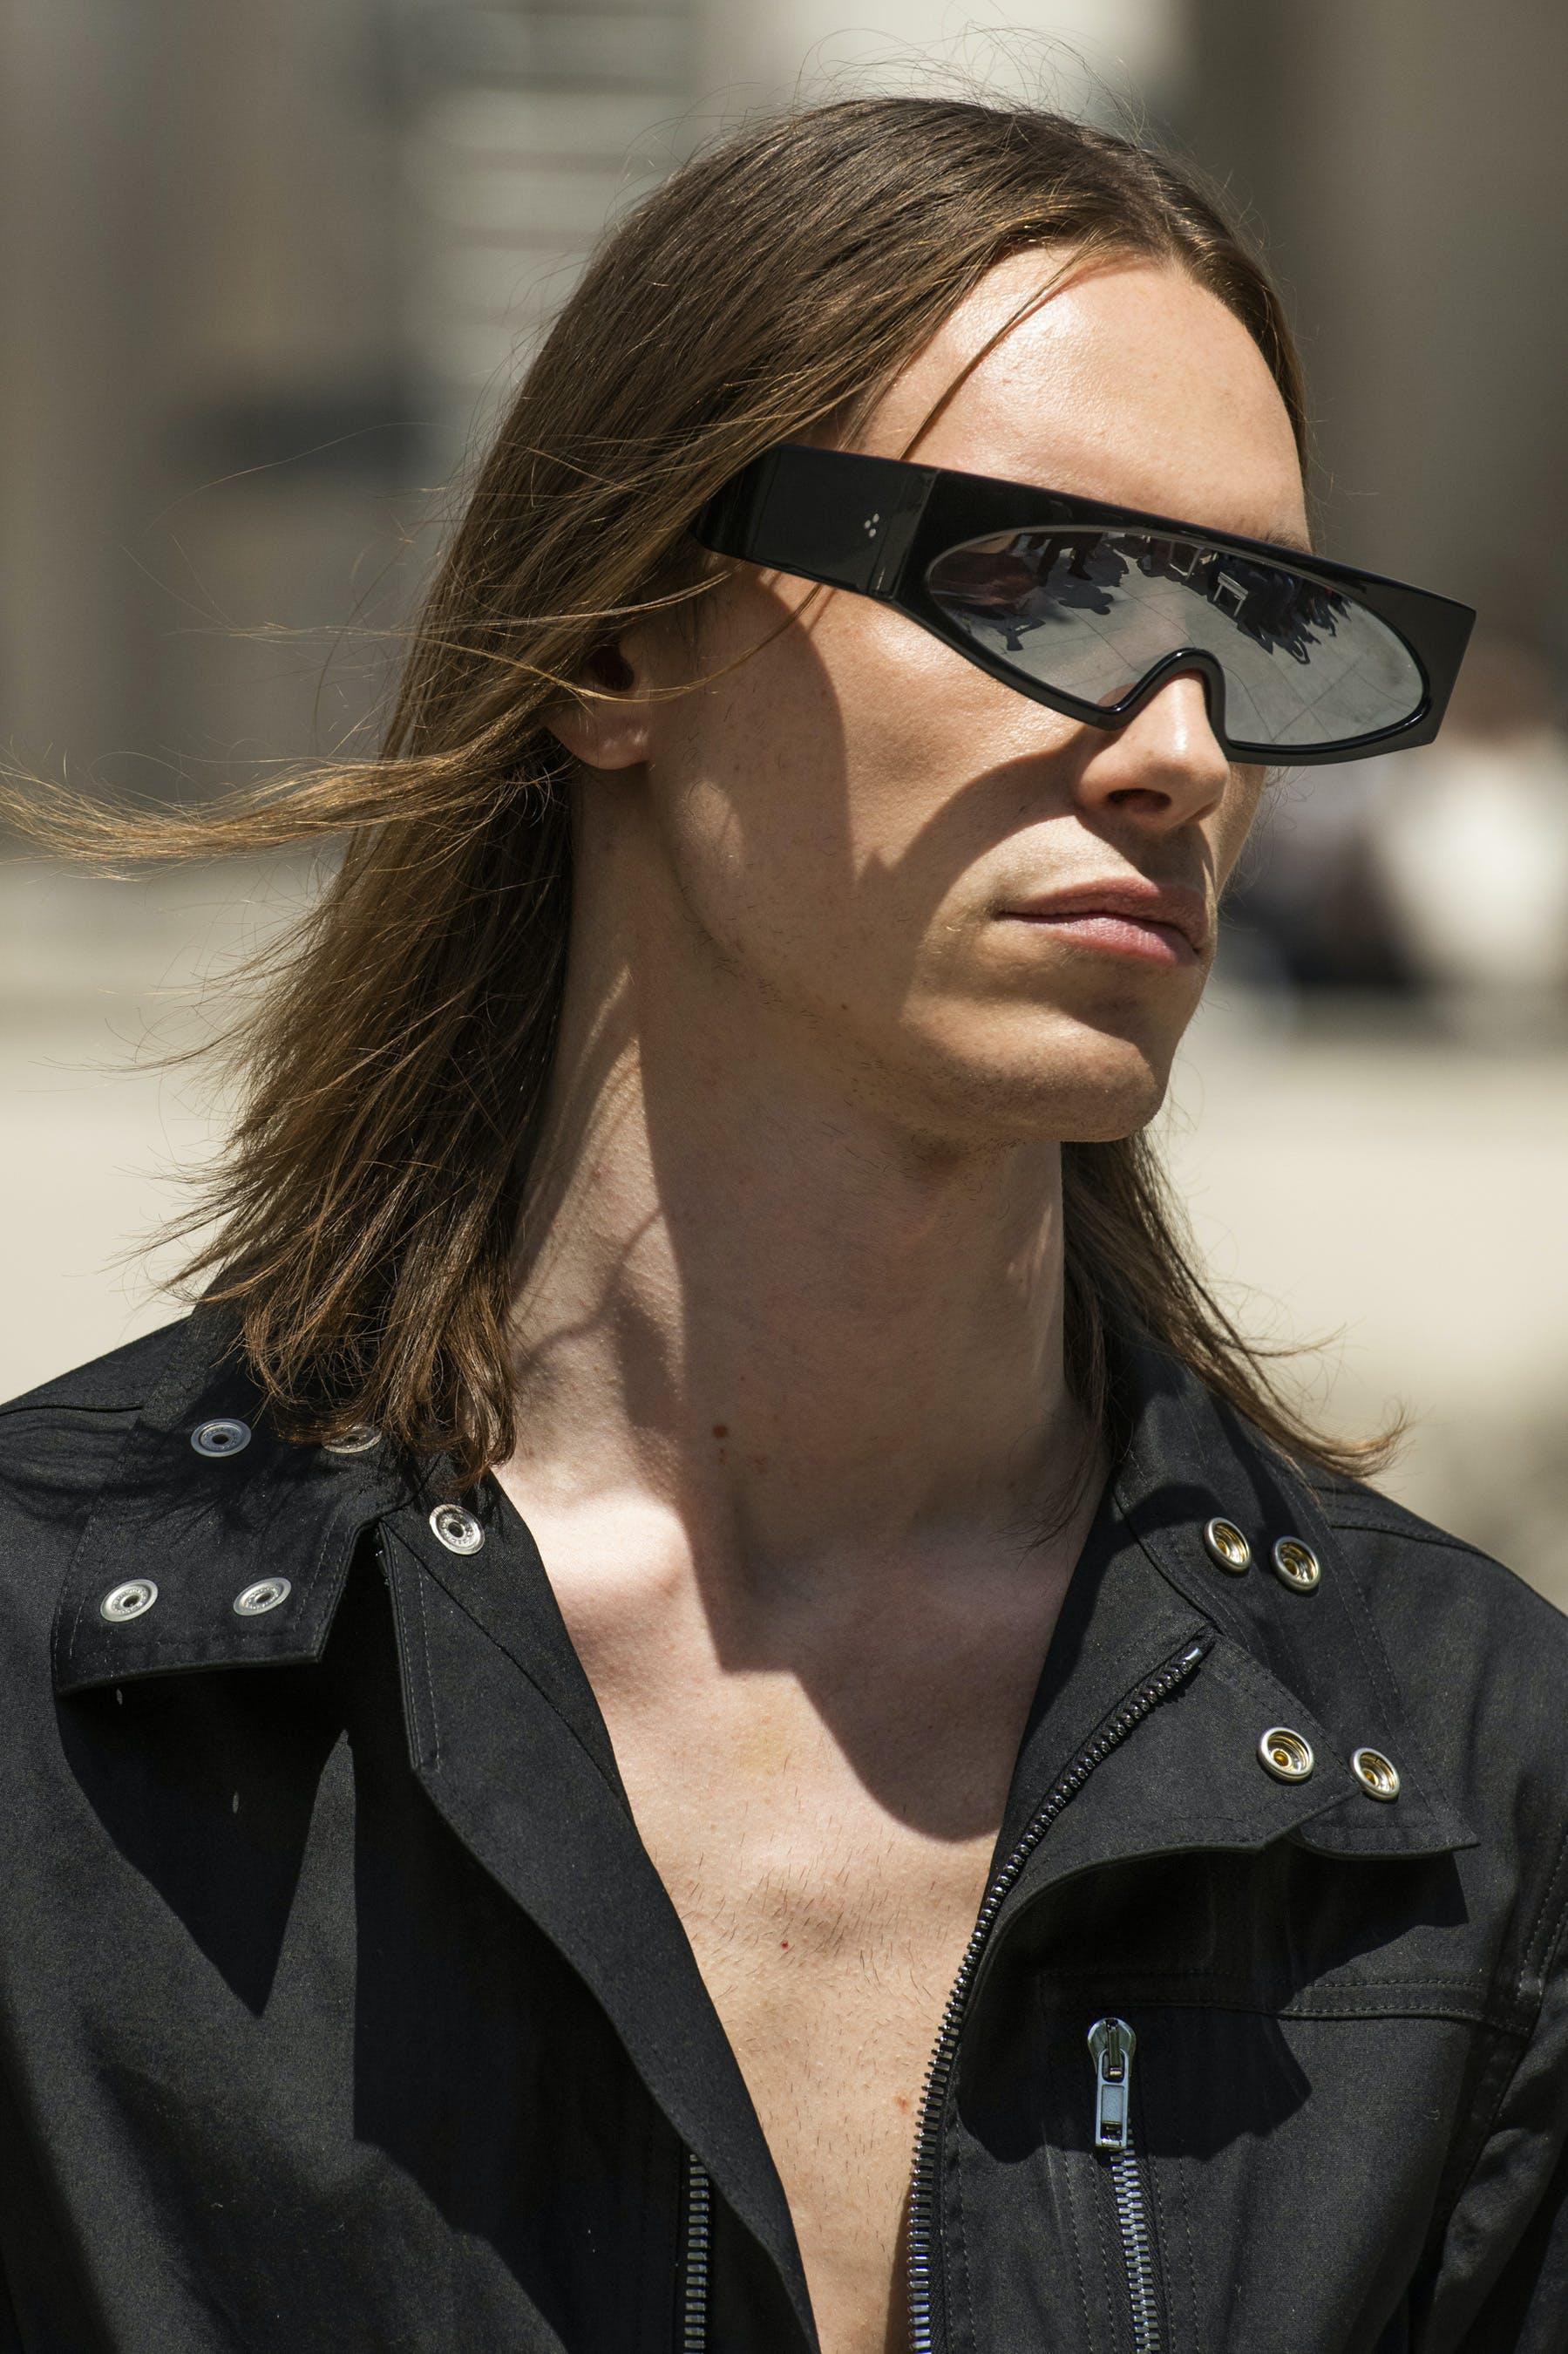 Rick Owens Runway Details Retro Futuristic Black Rectangular Framed Sunglasses Ies bodybag In Black Cotton Mens SS20 Tecautl